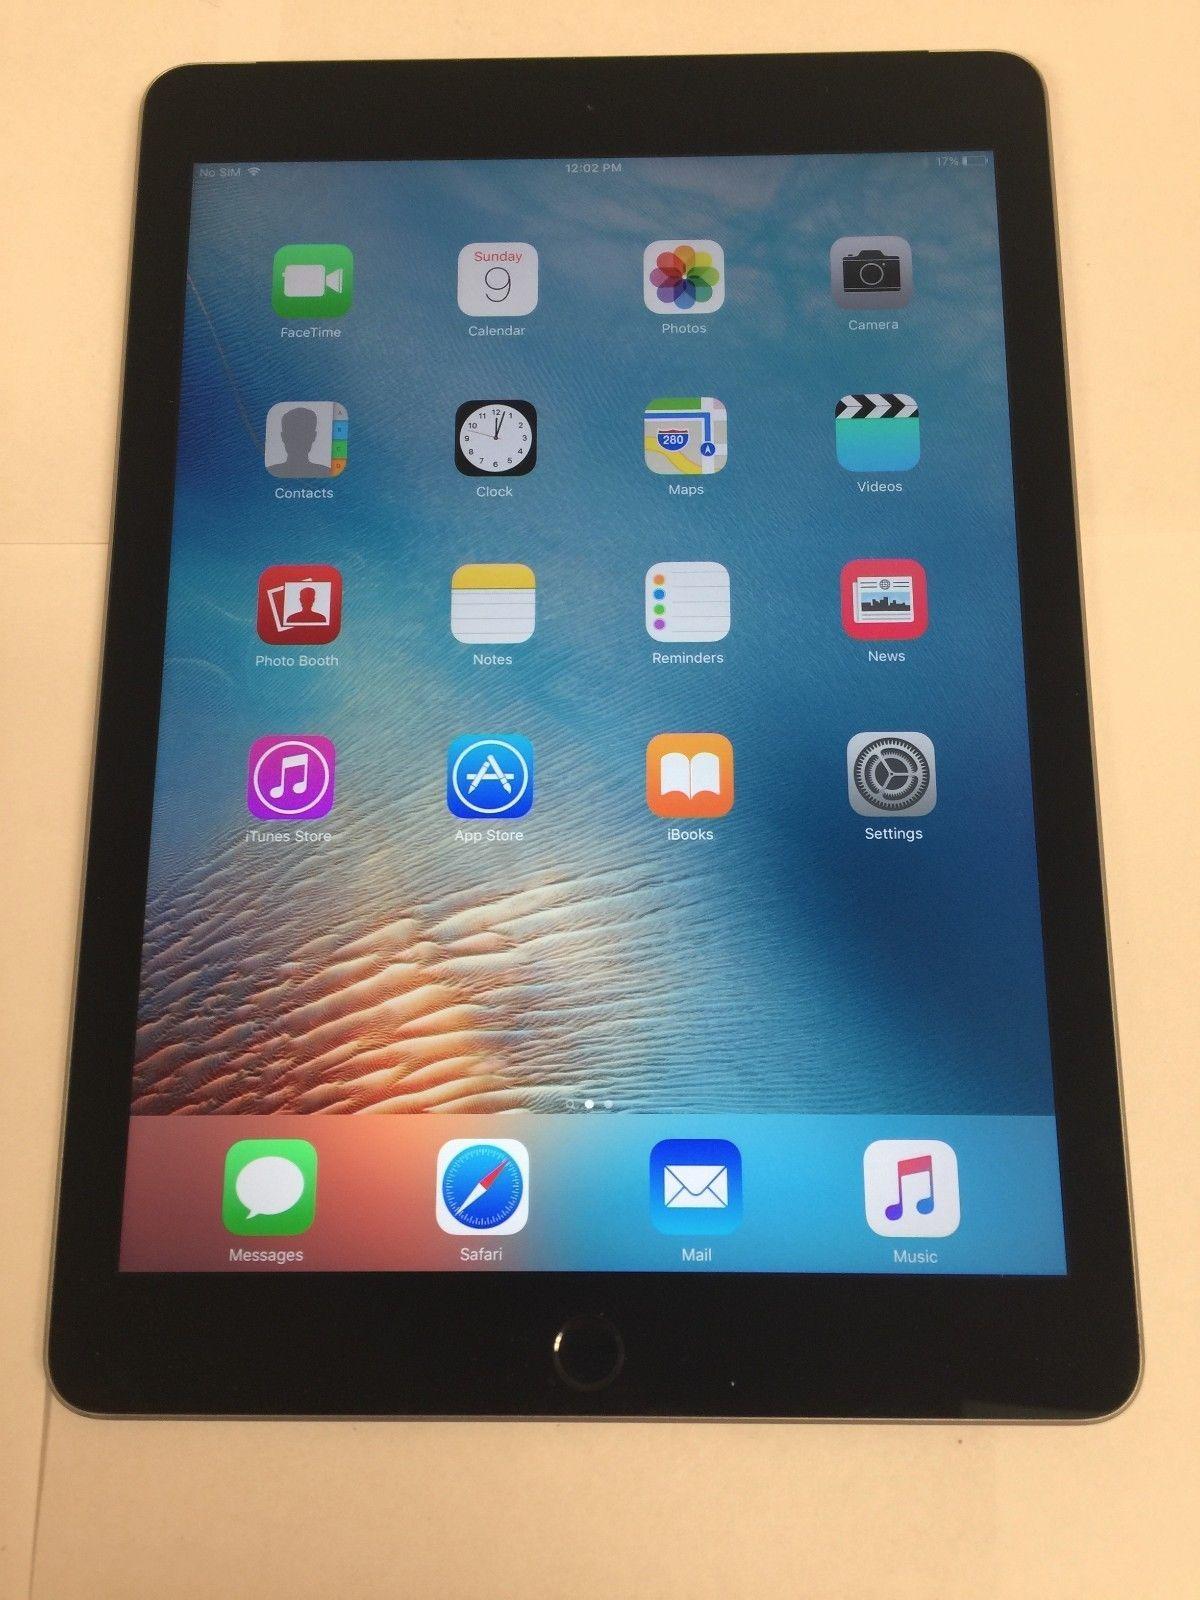 Apple Ipad Air 2 64gb Wi Fi Cellular 4g Lte Unlocked Space Gray